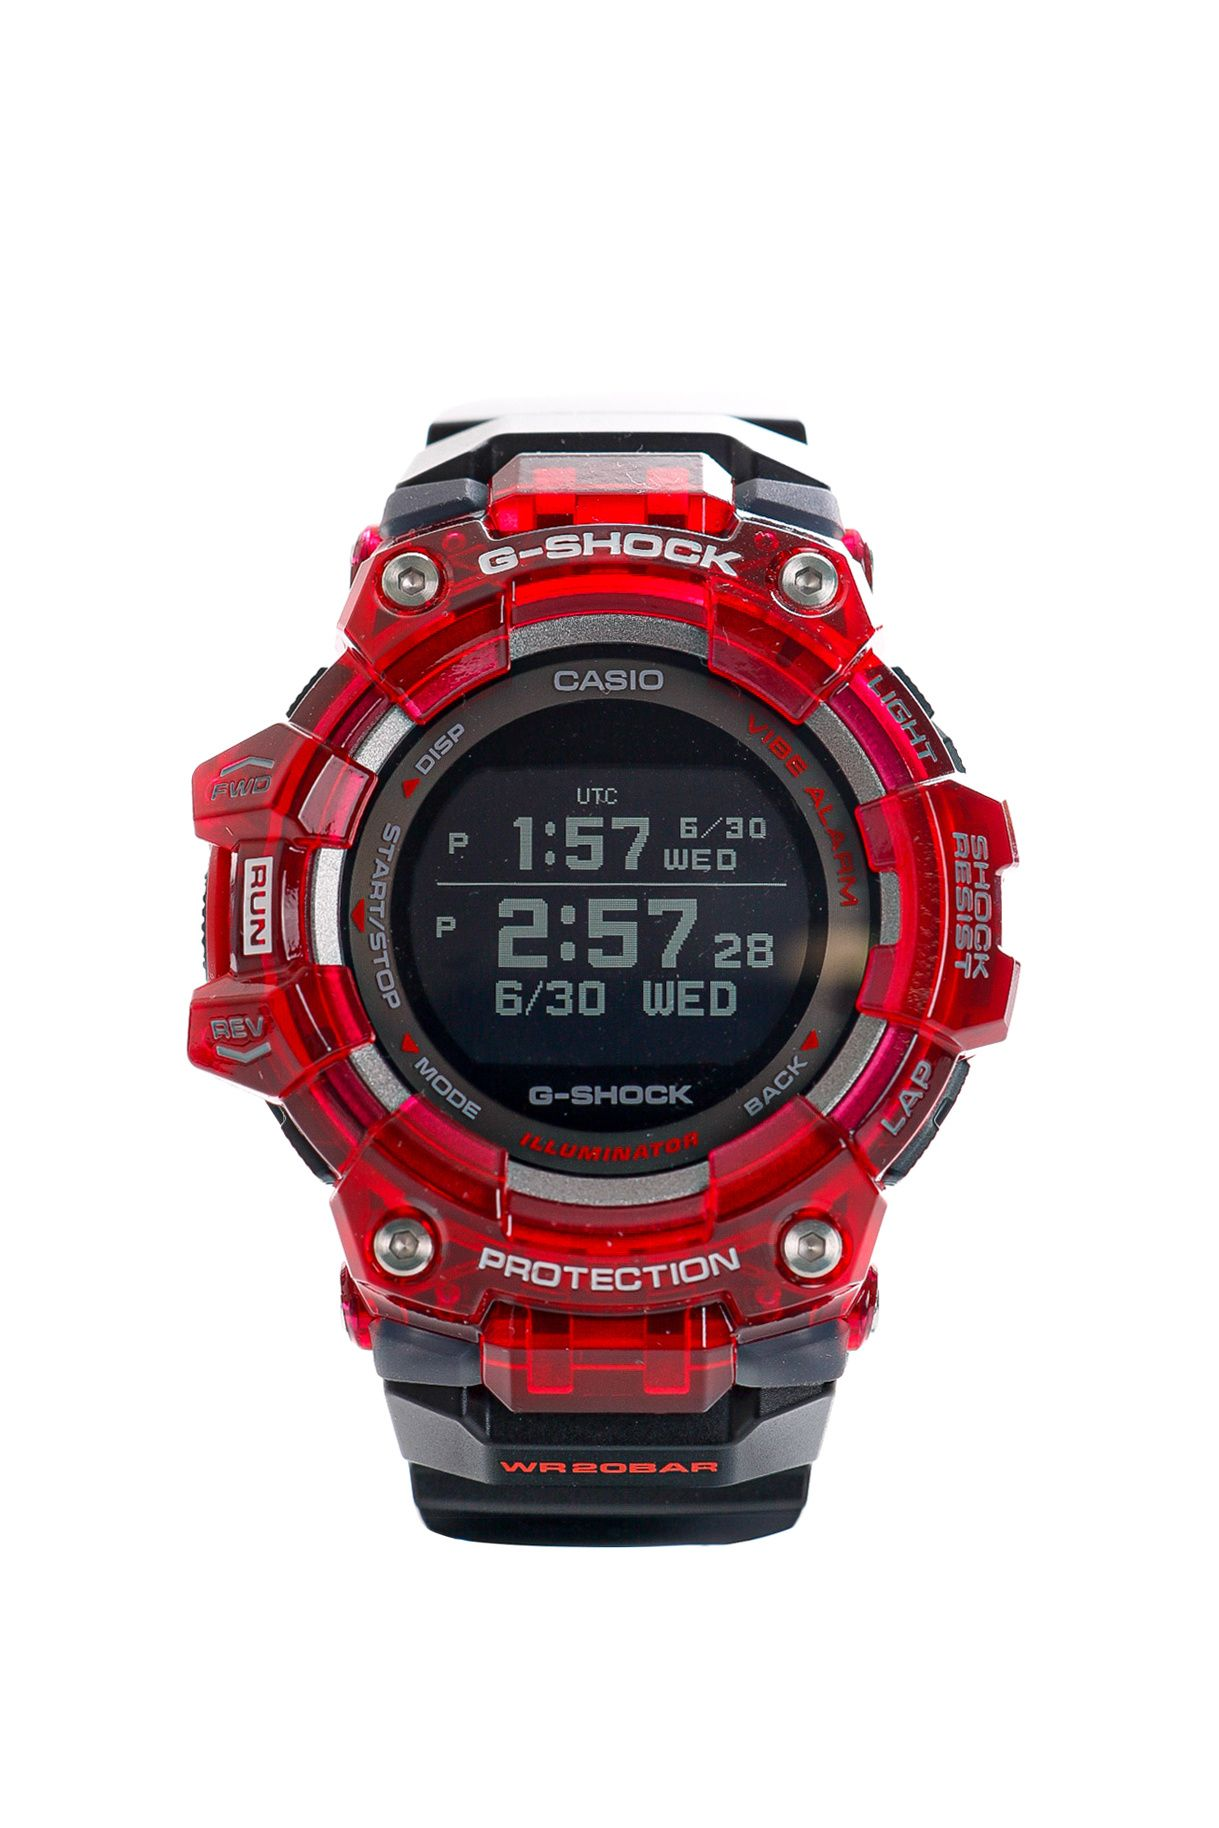 Afbeelding van Casio Horloge G-SHOCK Physical Lab GBD-100SM Red/Black